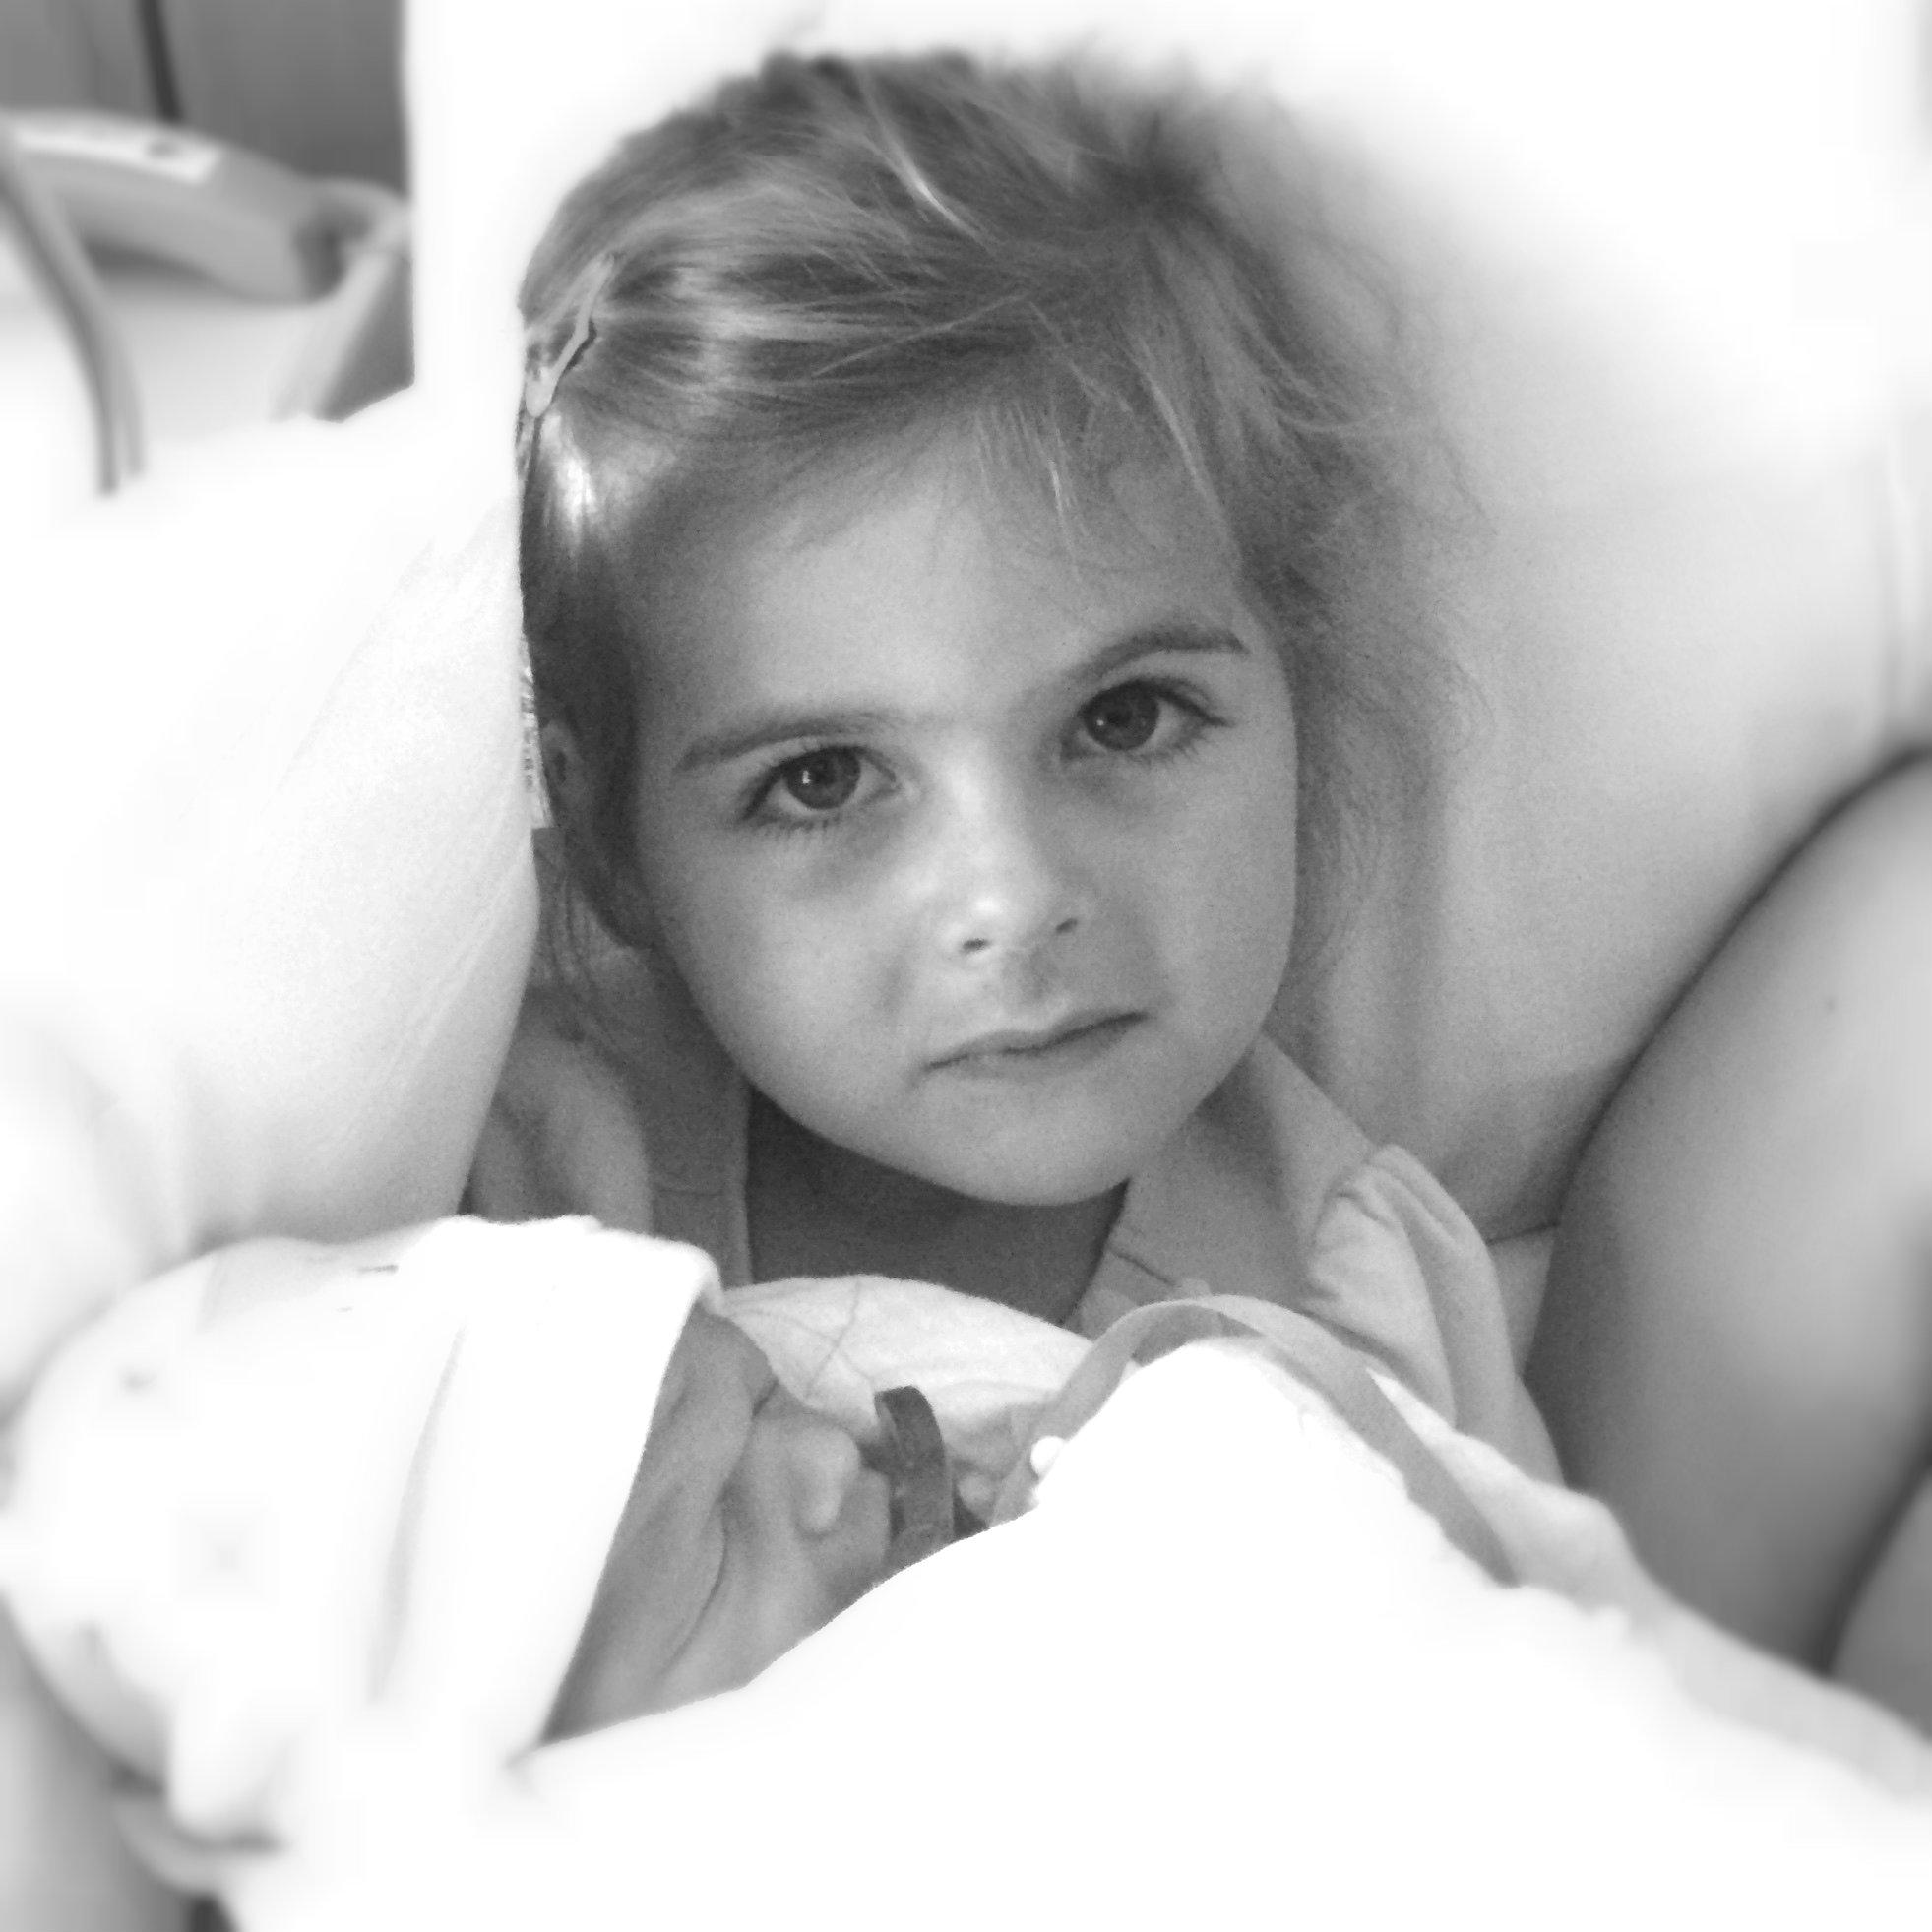 Beau in hospital